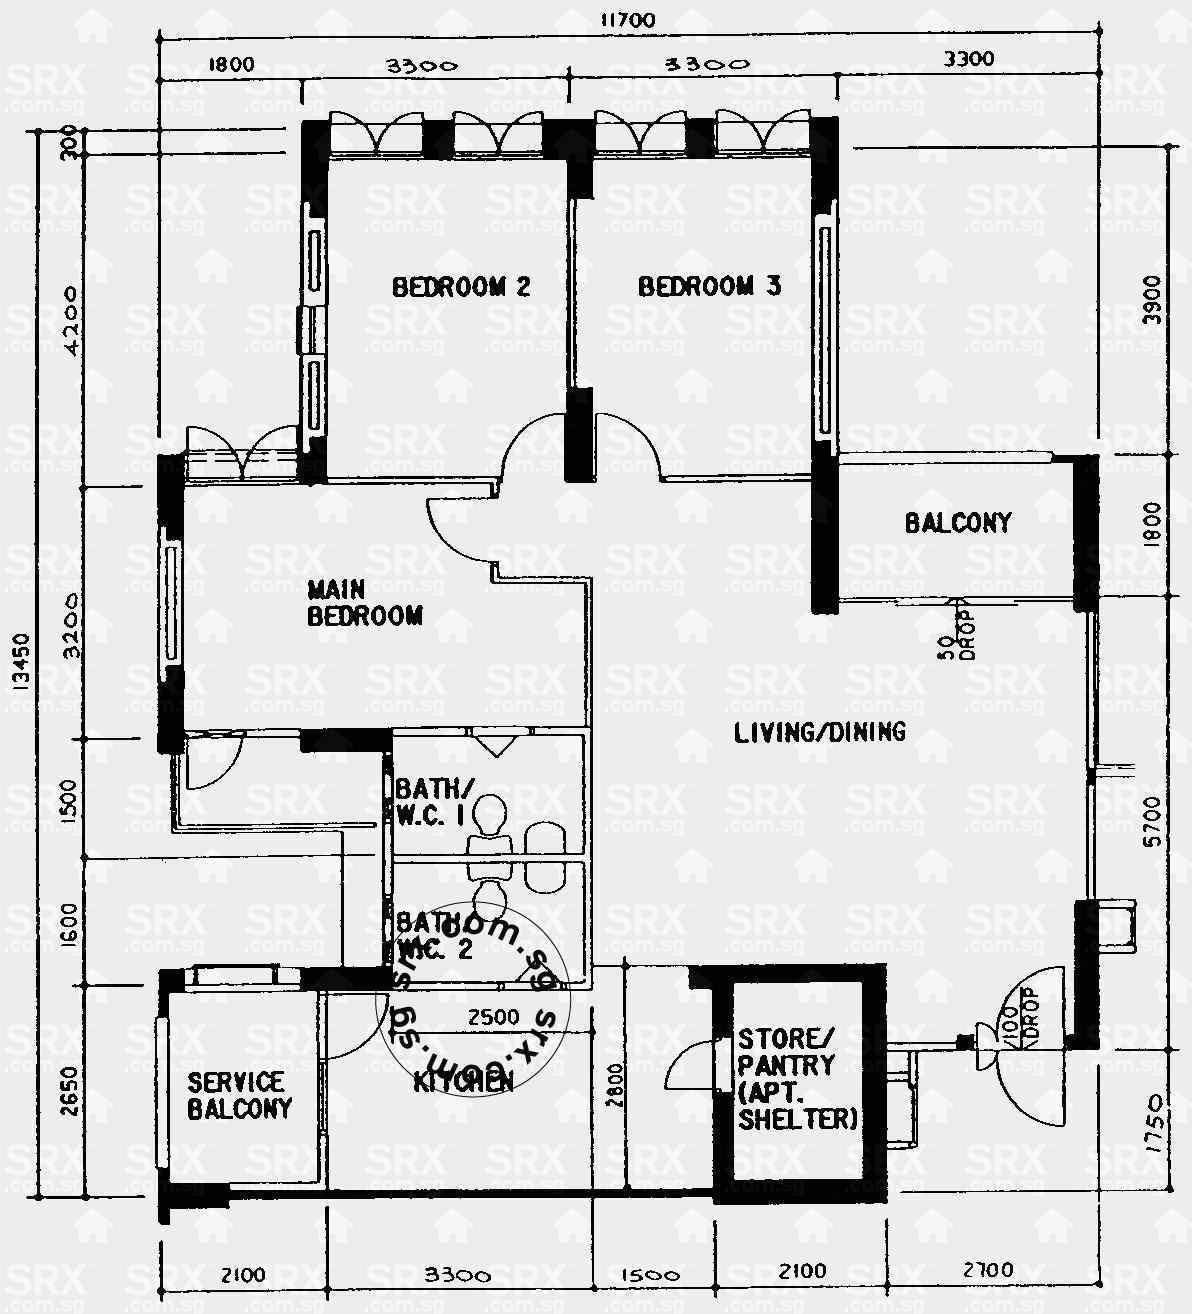 hougang street 91 hdb details srx property hougang street 51 hdb details srx property